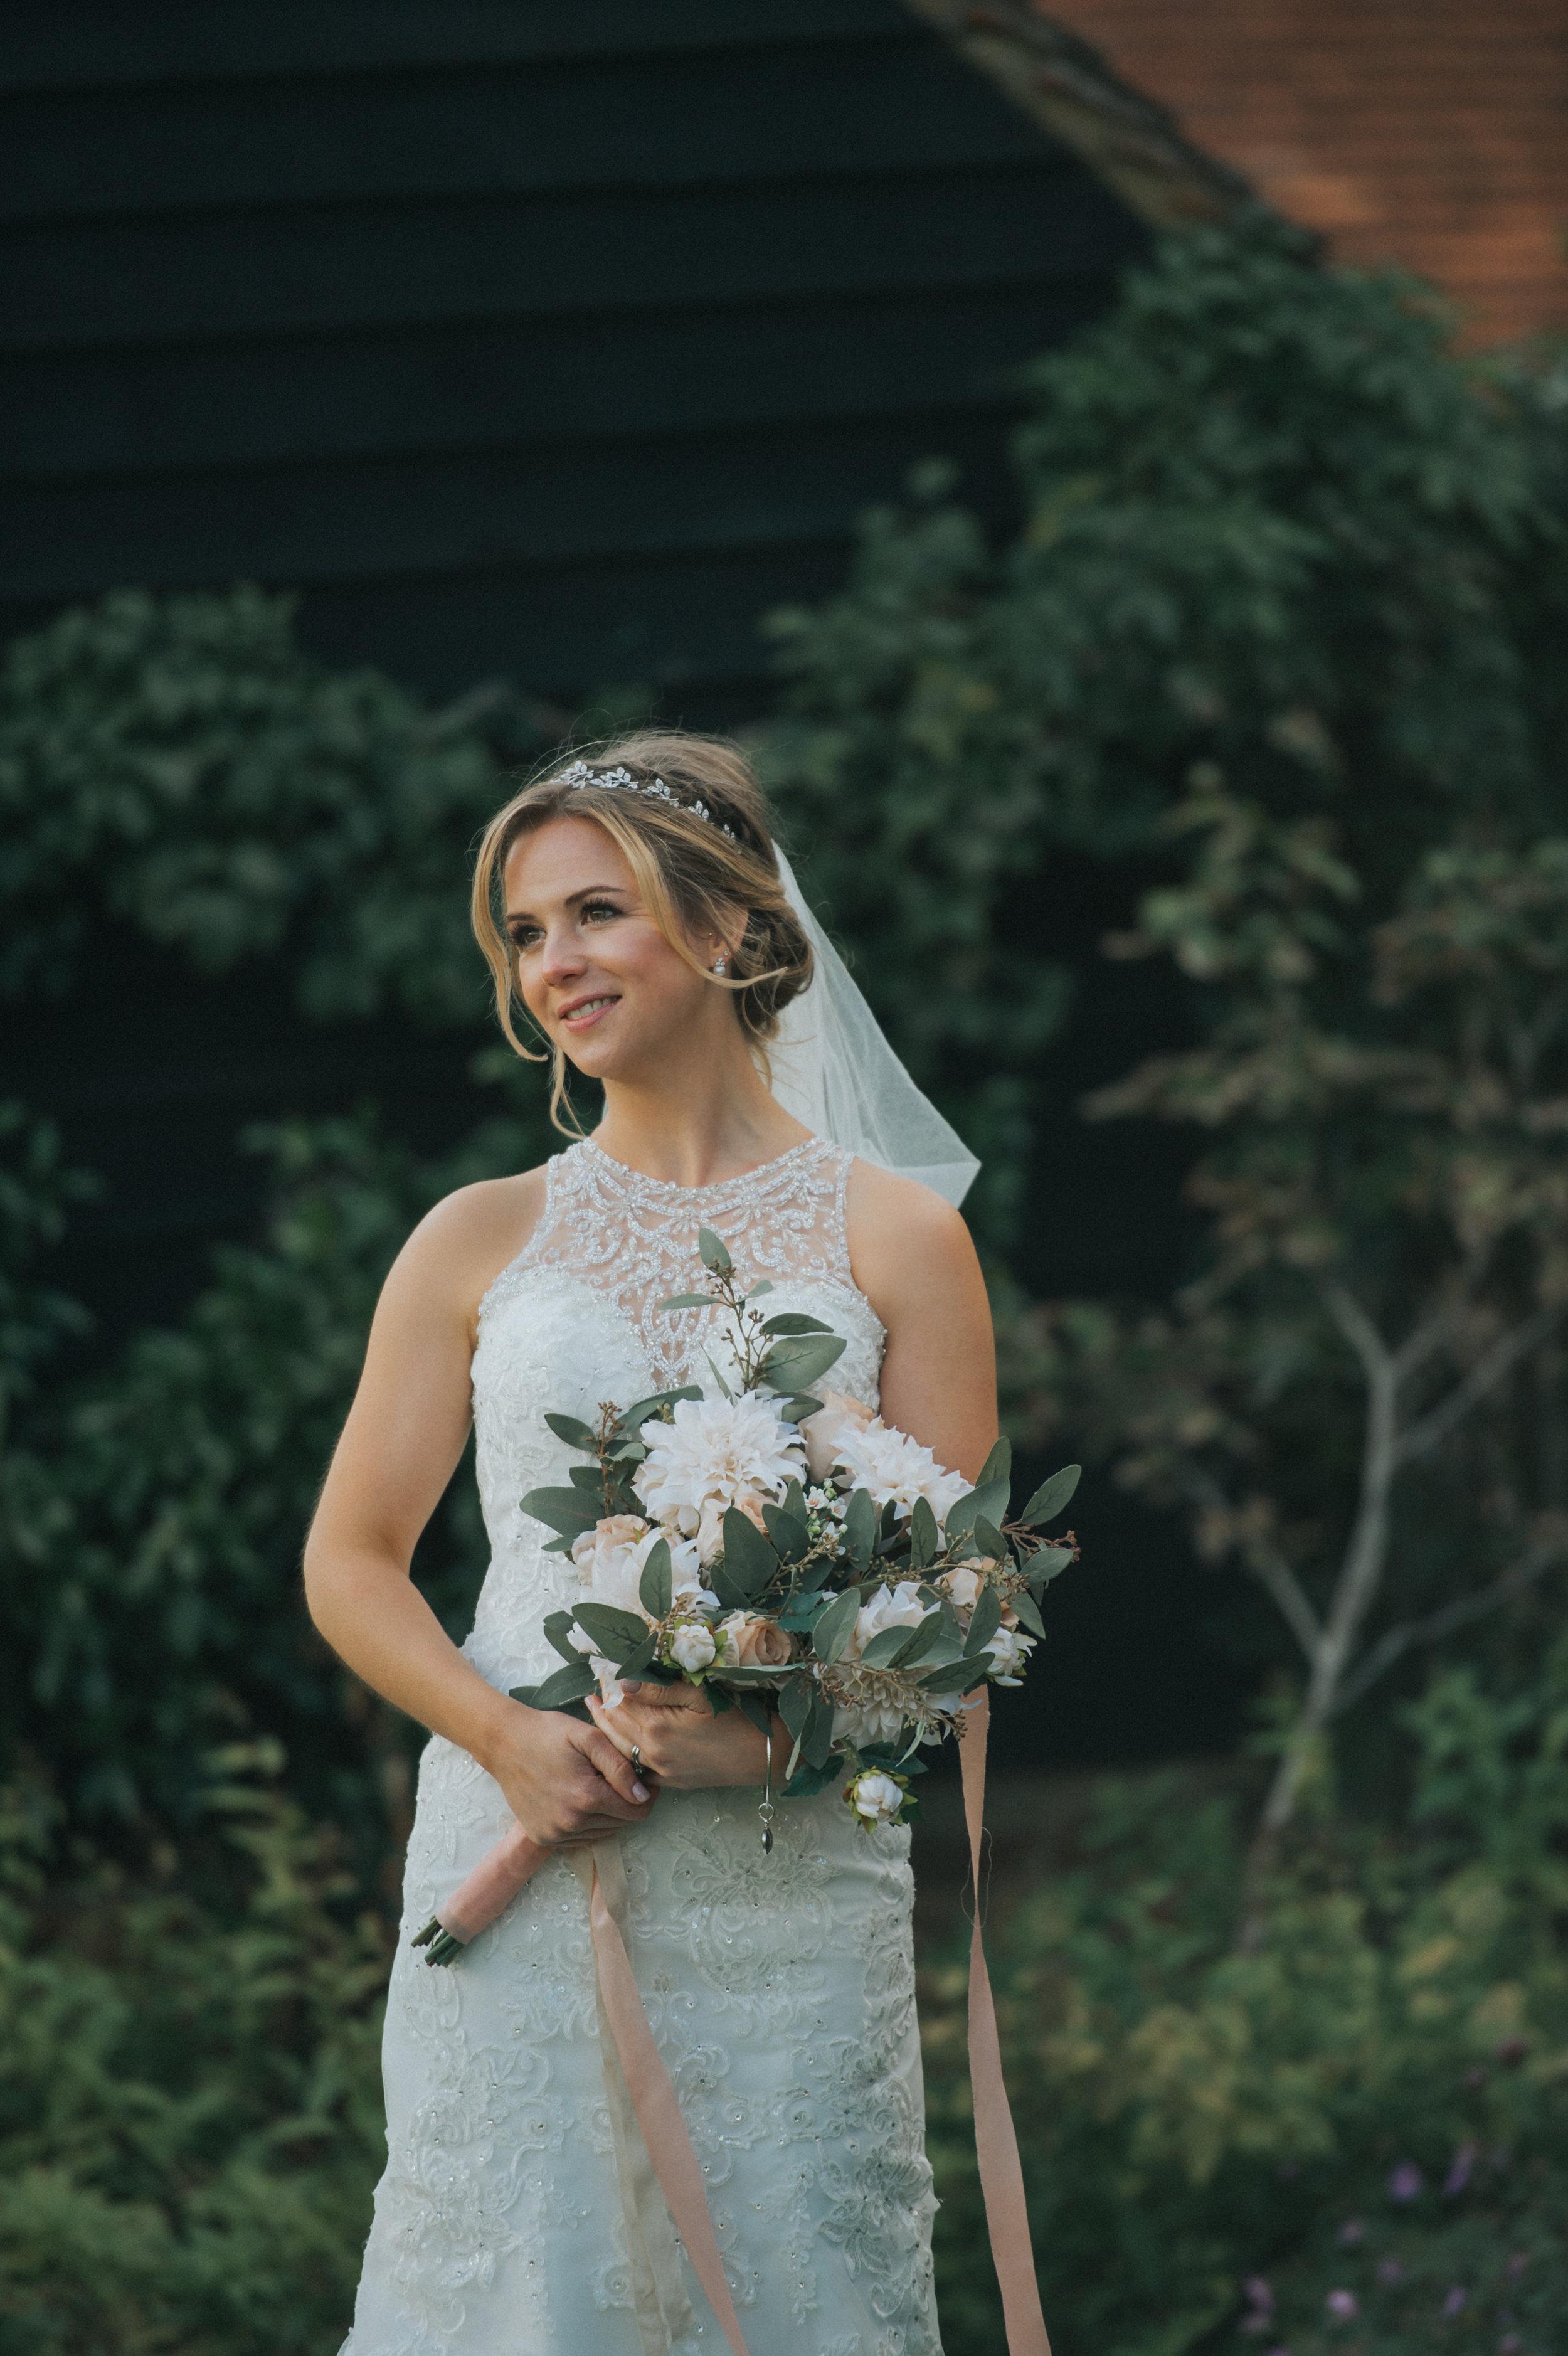 Brides-Makeup-Beautician-SB-Beauty.jpg